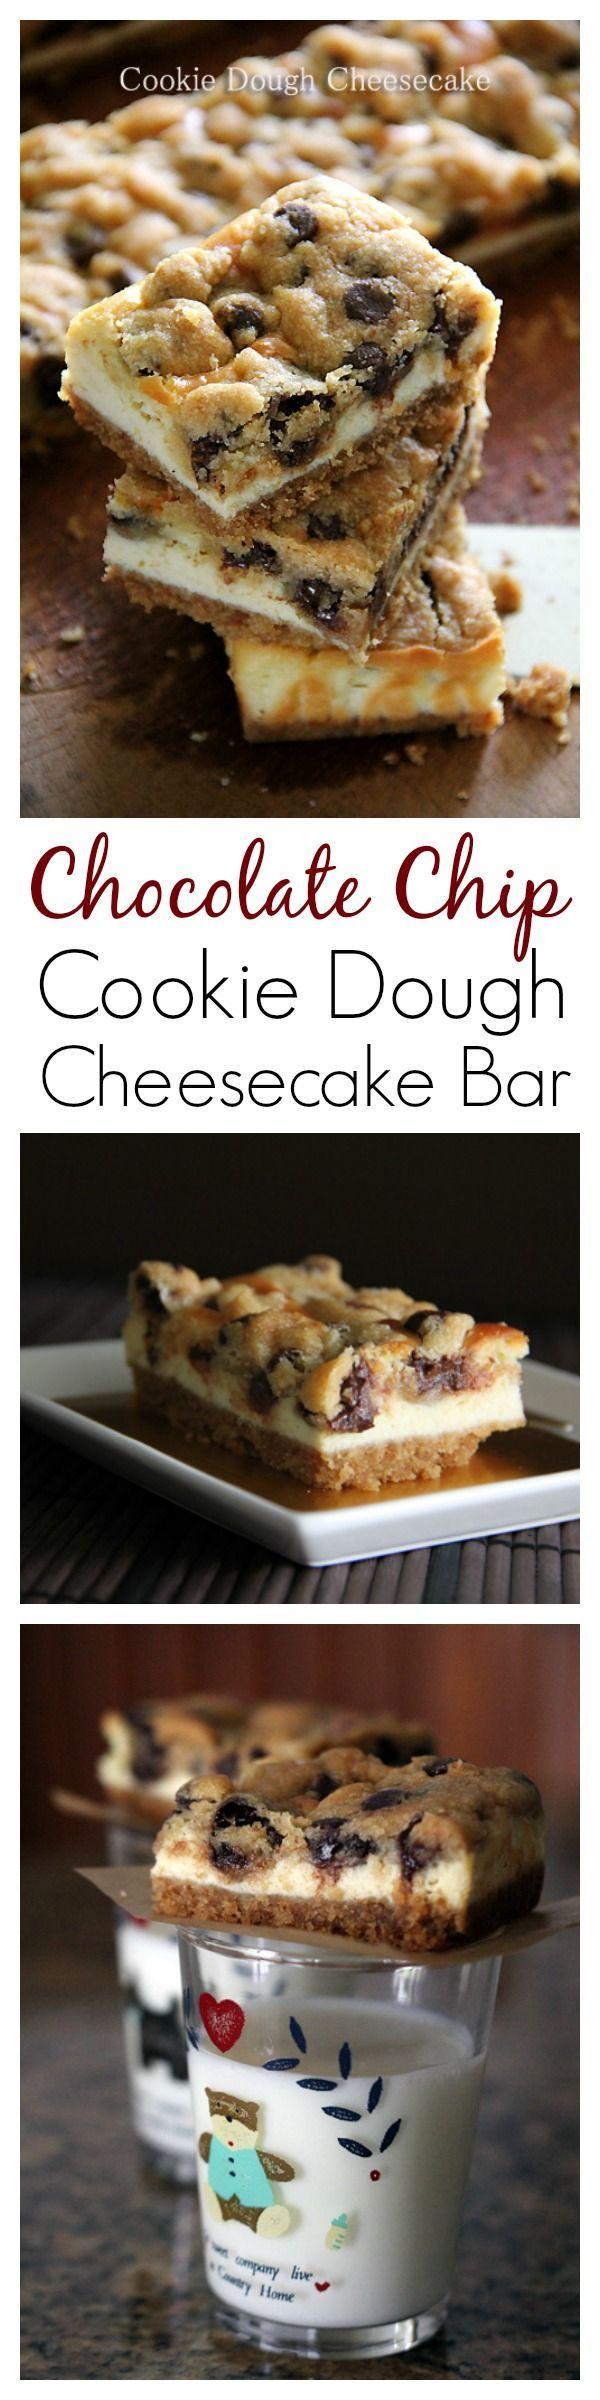 Chocolate Chip Cookie Dough Cheesecake Bar Recipe